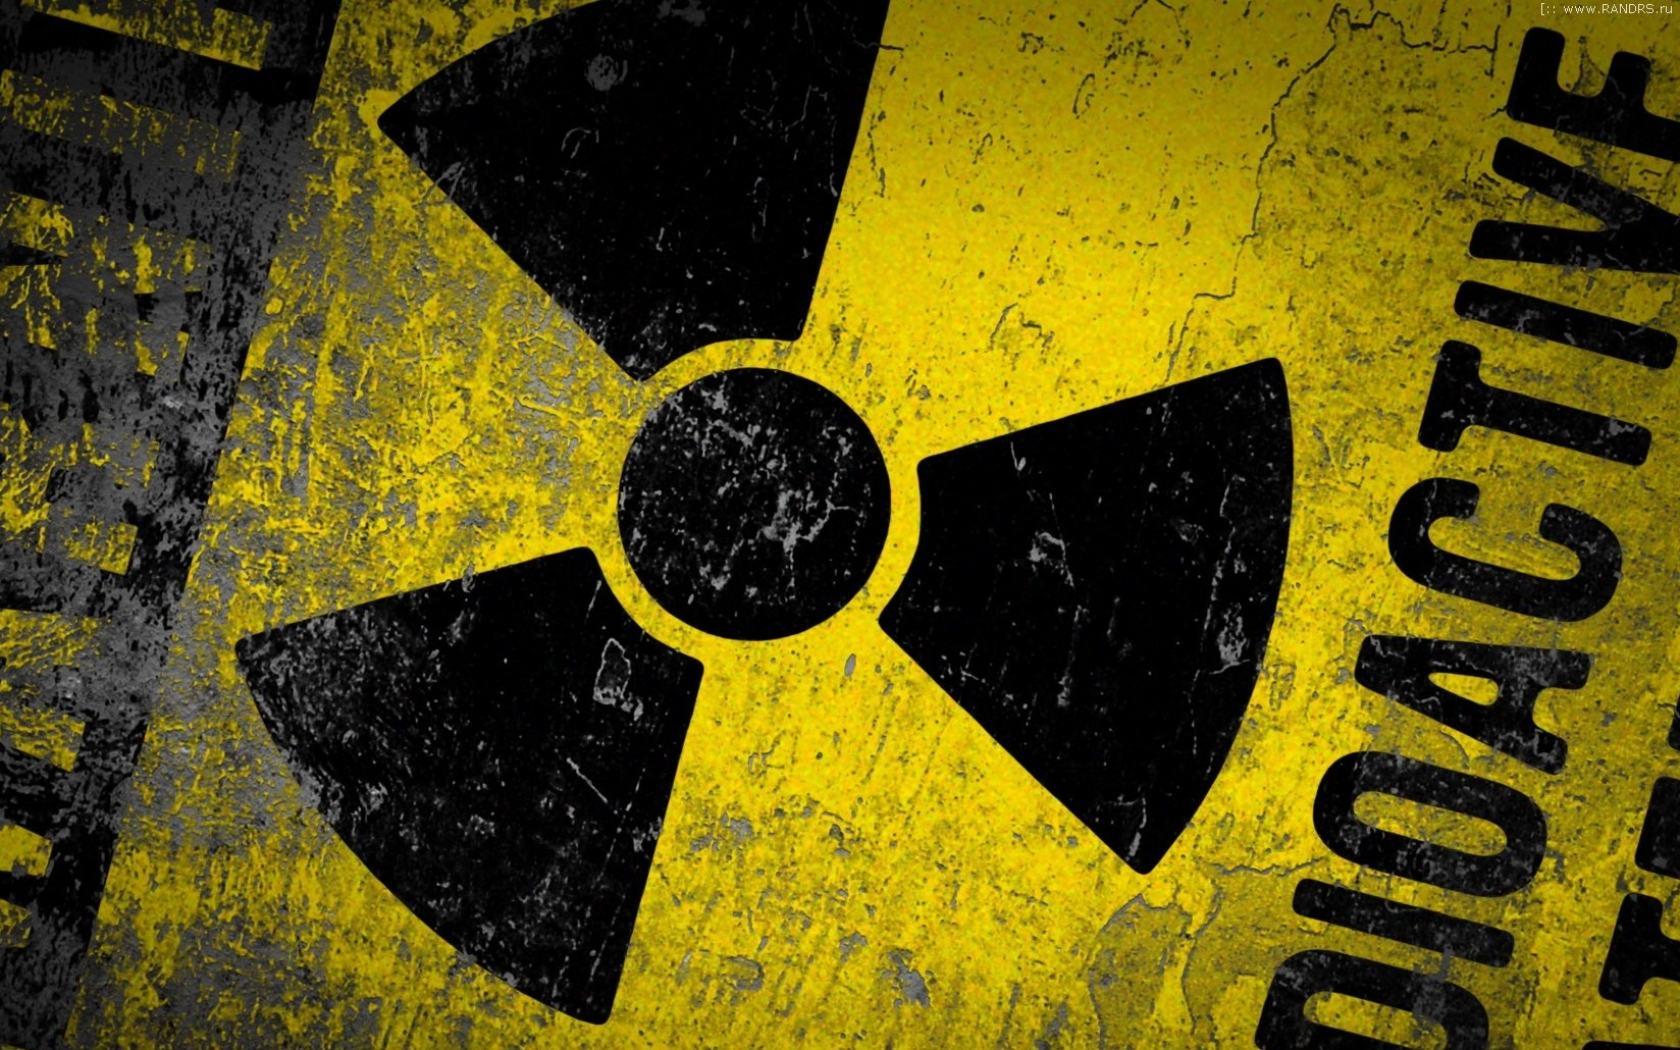 radioaktivnost_1680x1050